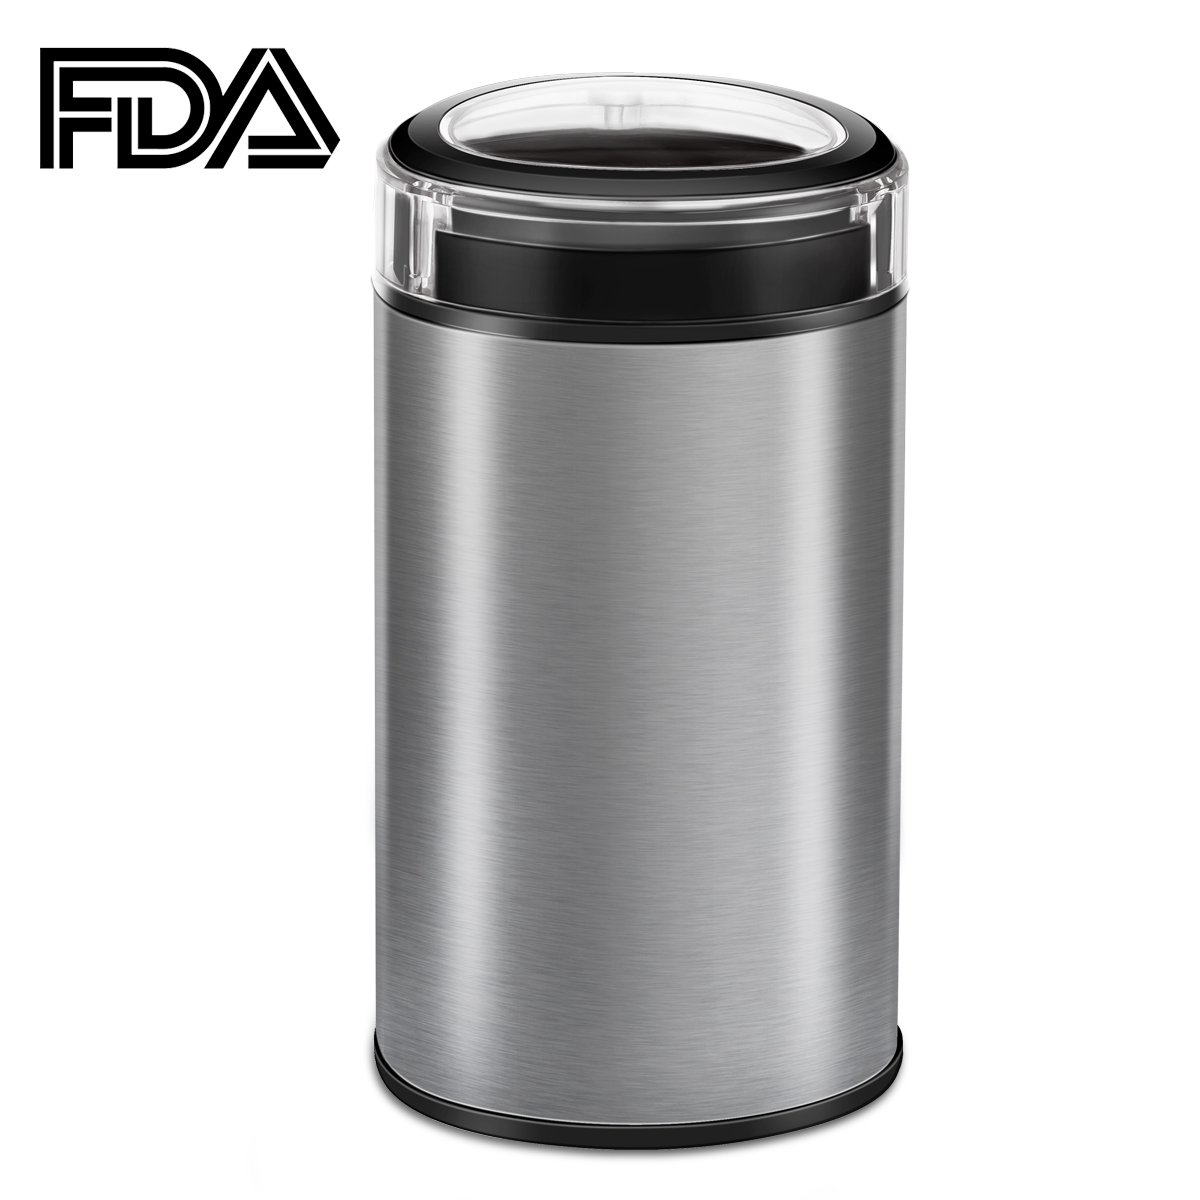 [2 Pack]Coffee Grinder Electric, TOBOX Multifunctional Stainless Steel Blade Coffee Grinder Fast Grinding Coffee Beans, Nuts, Grains, Spices